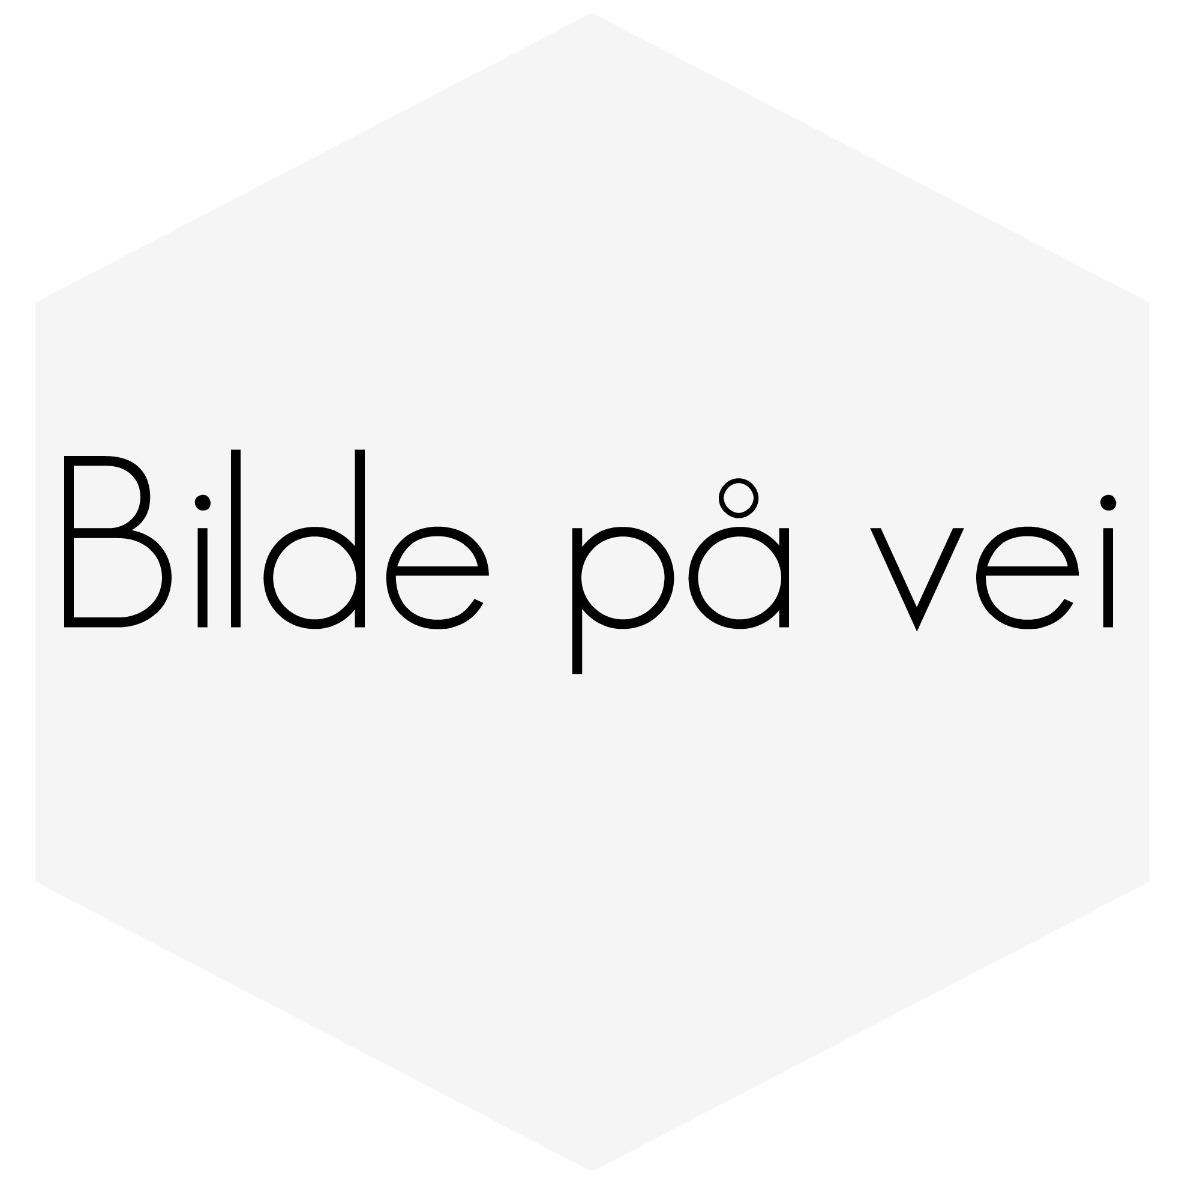 "SPOILER BAK 850 R-""LOOK"" PASSER OGSÅ 240 OG 940 Tilbudspris!"